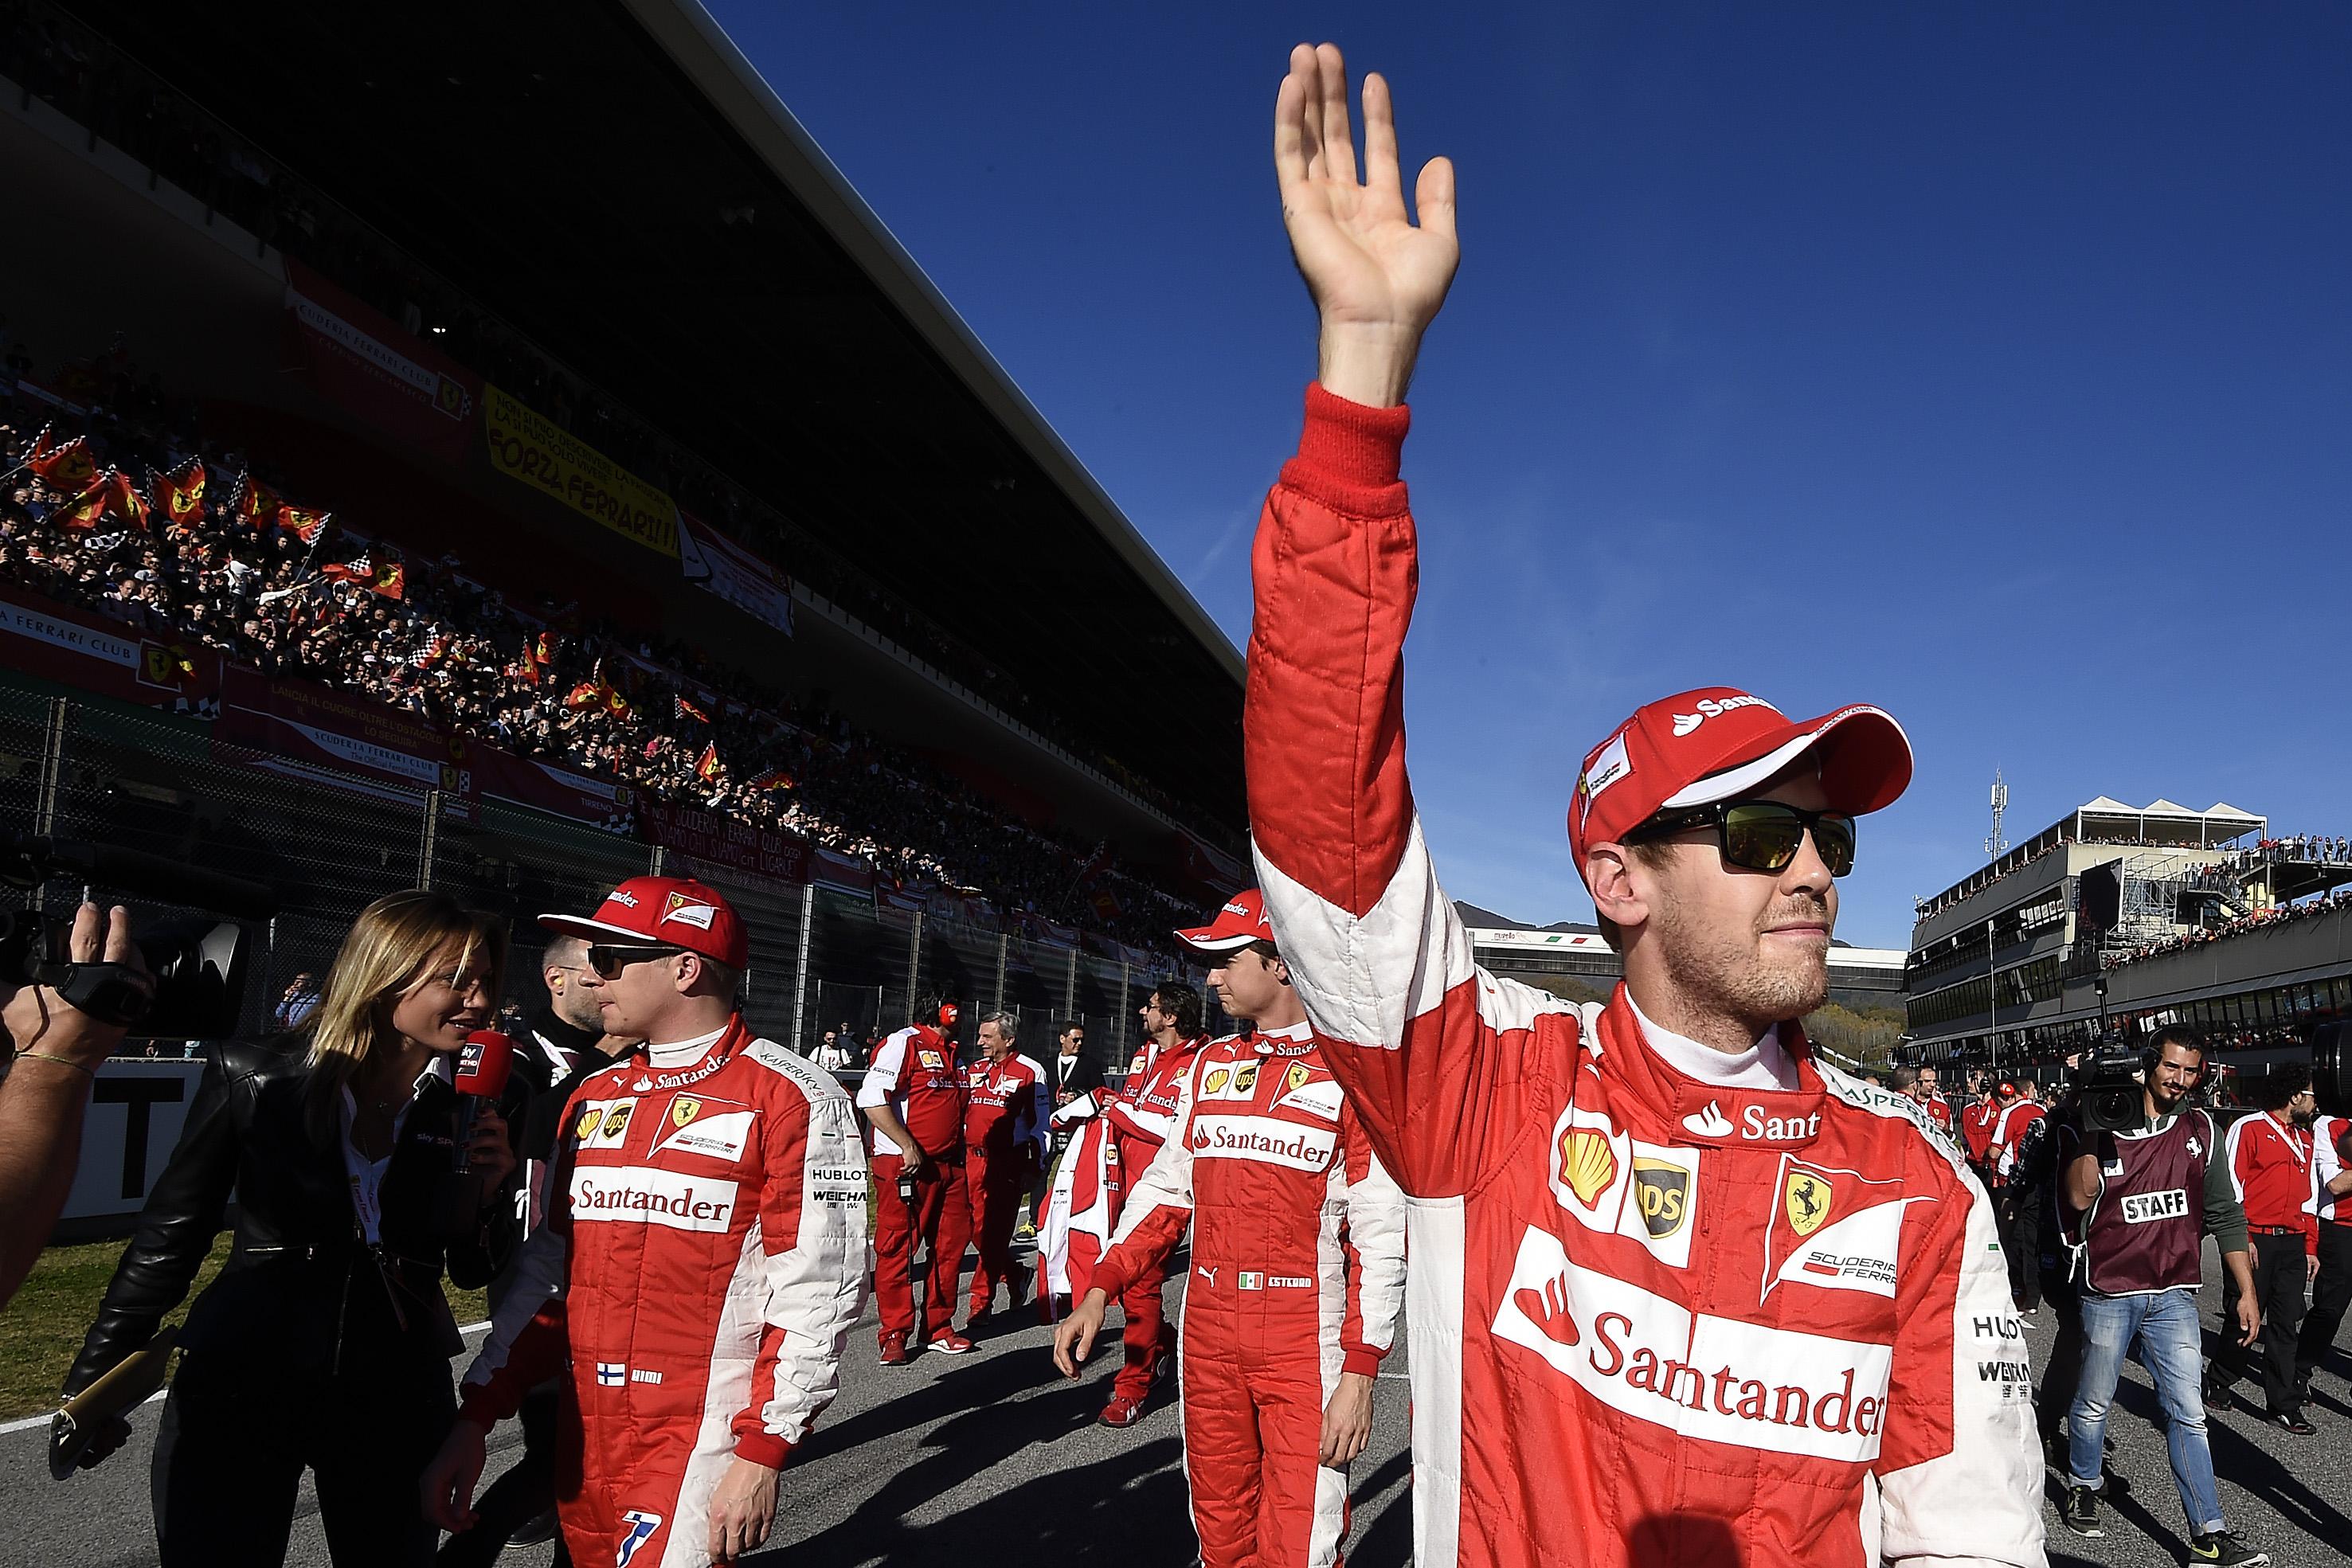 Finali Mondiali: l'emozione di Vettel e Raikkonen